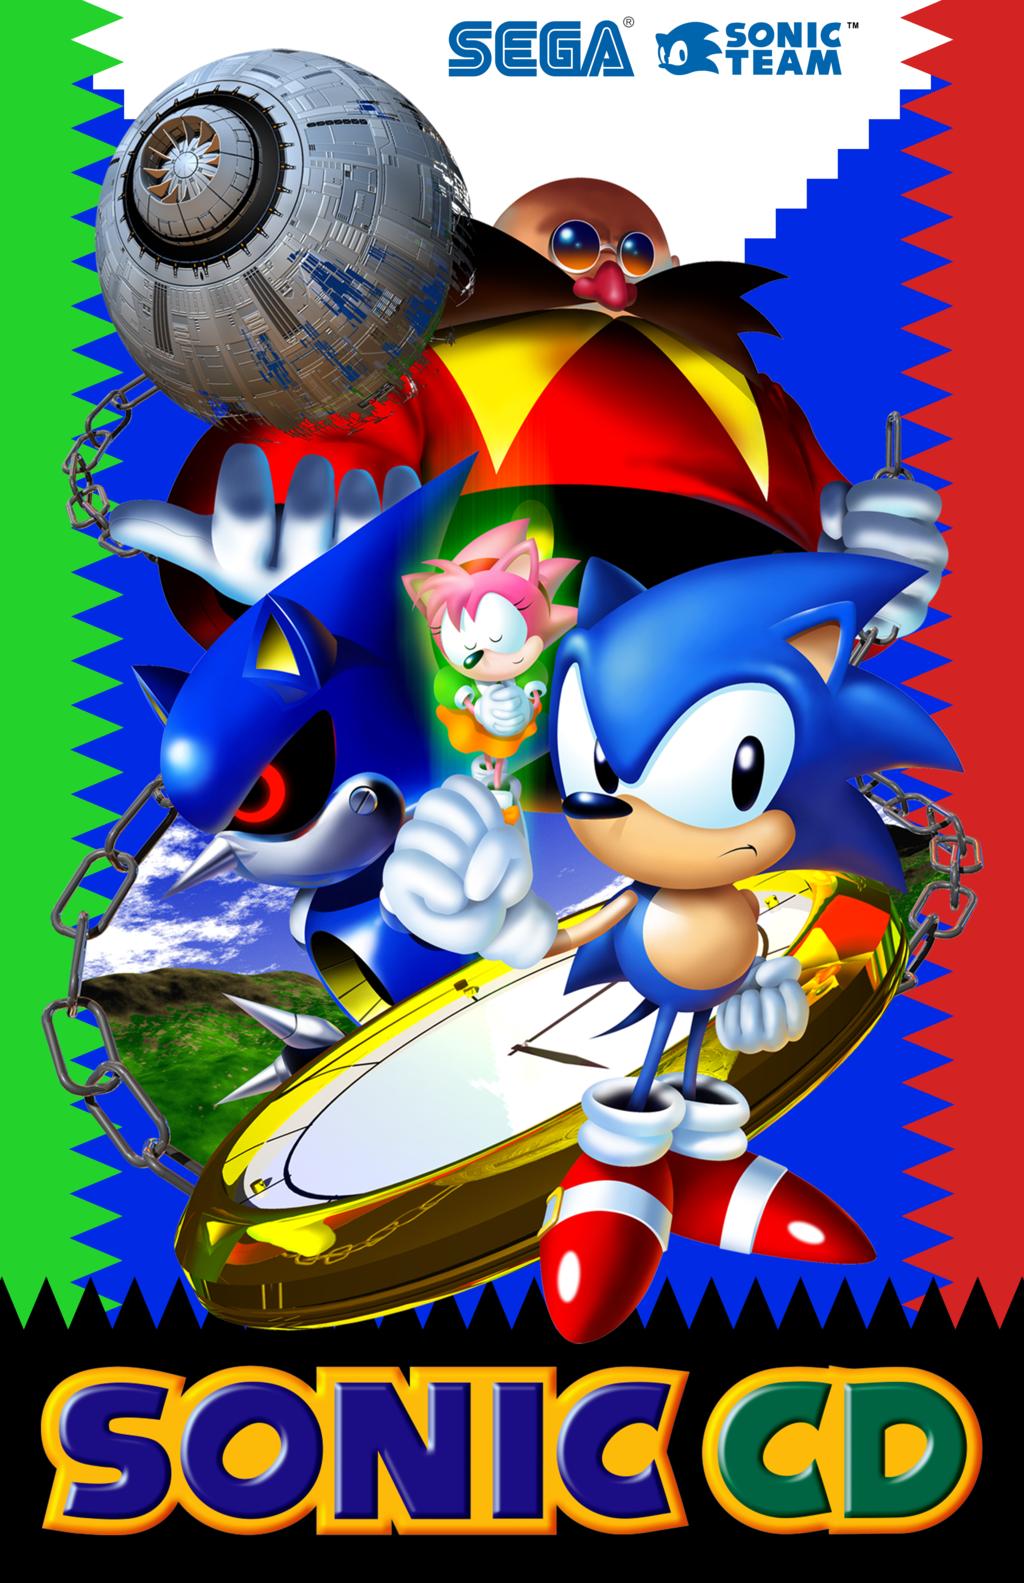 Pin By Jacob Meeler On Sonic The Hedgehog Retro Wallpaper Sonic Cartoon Wallpaper